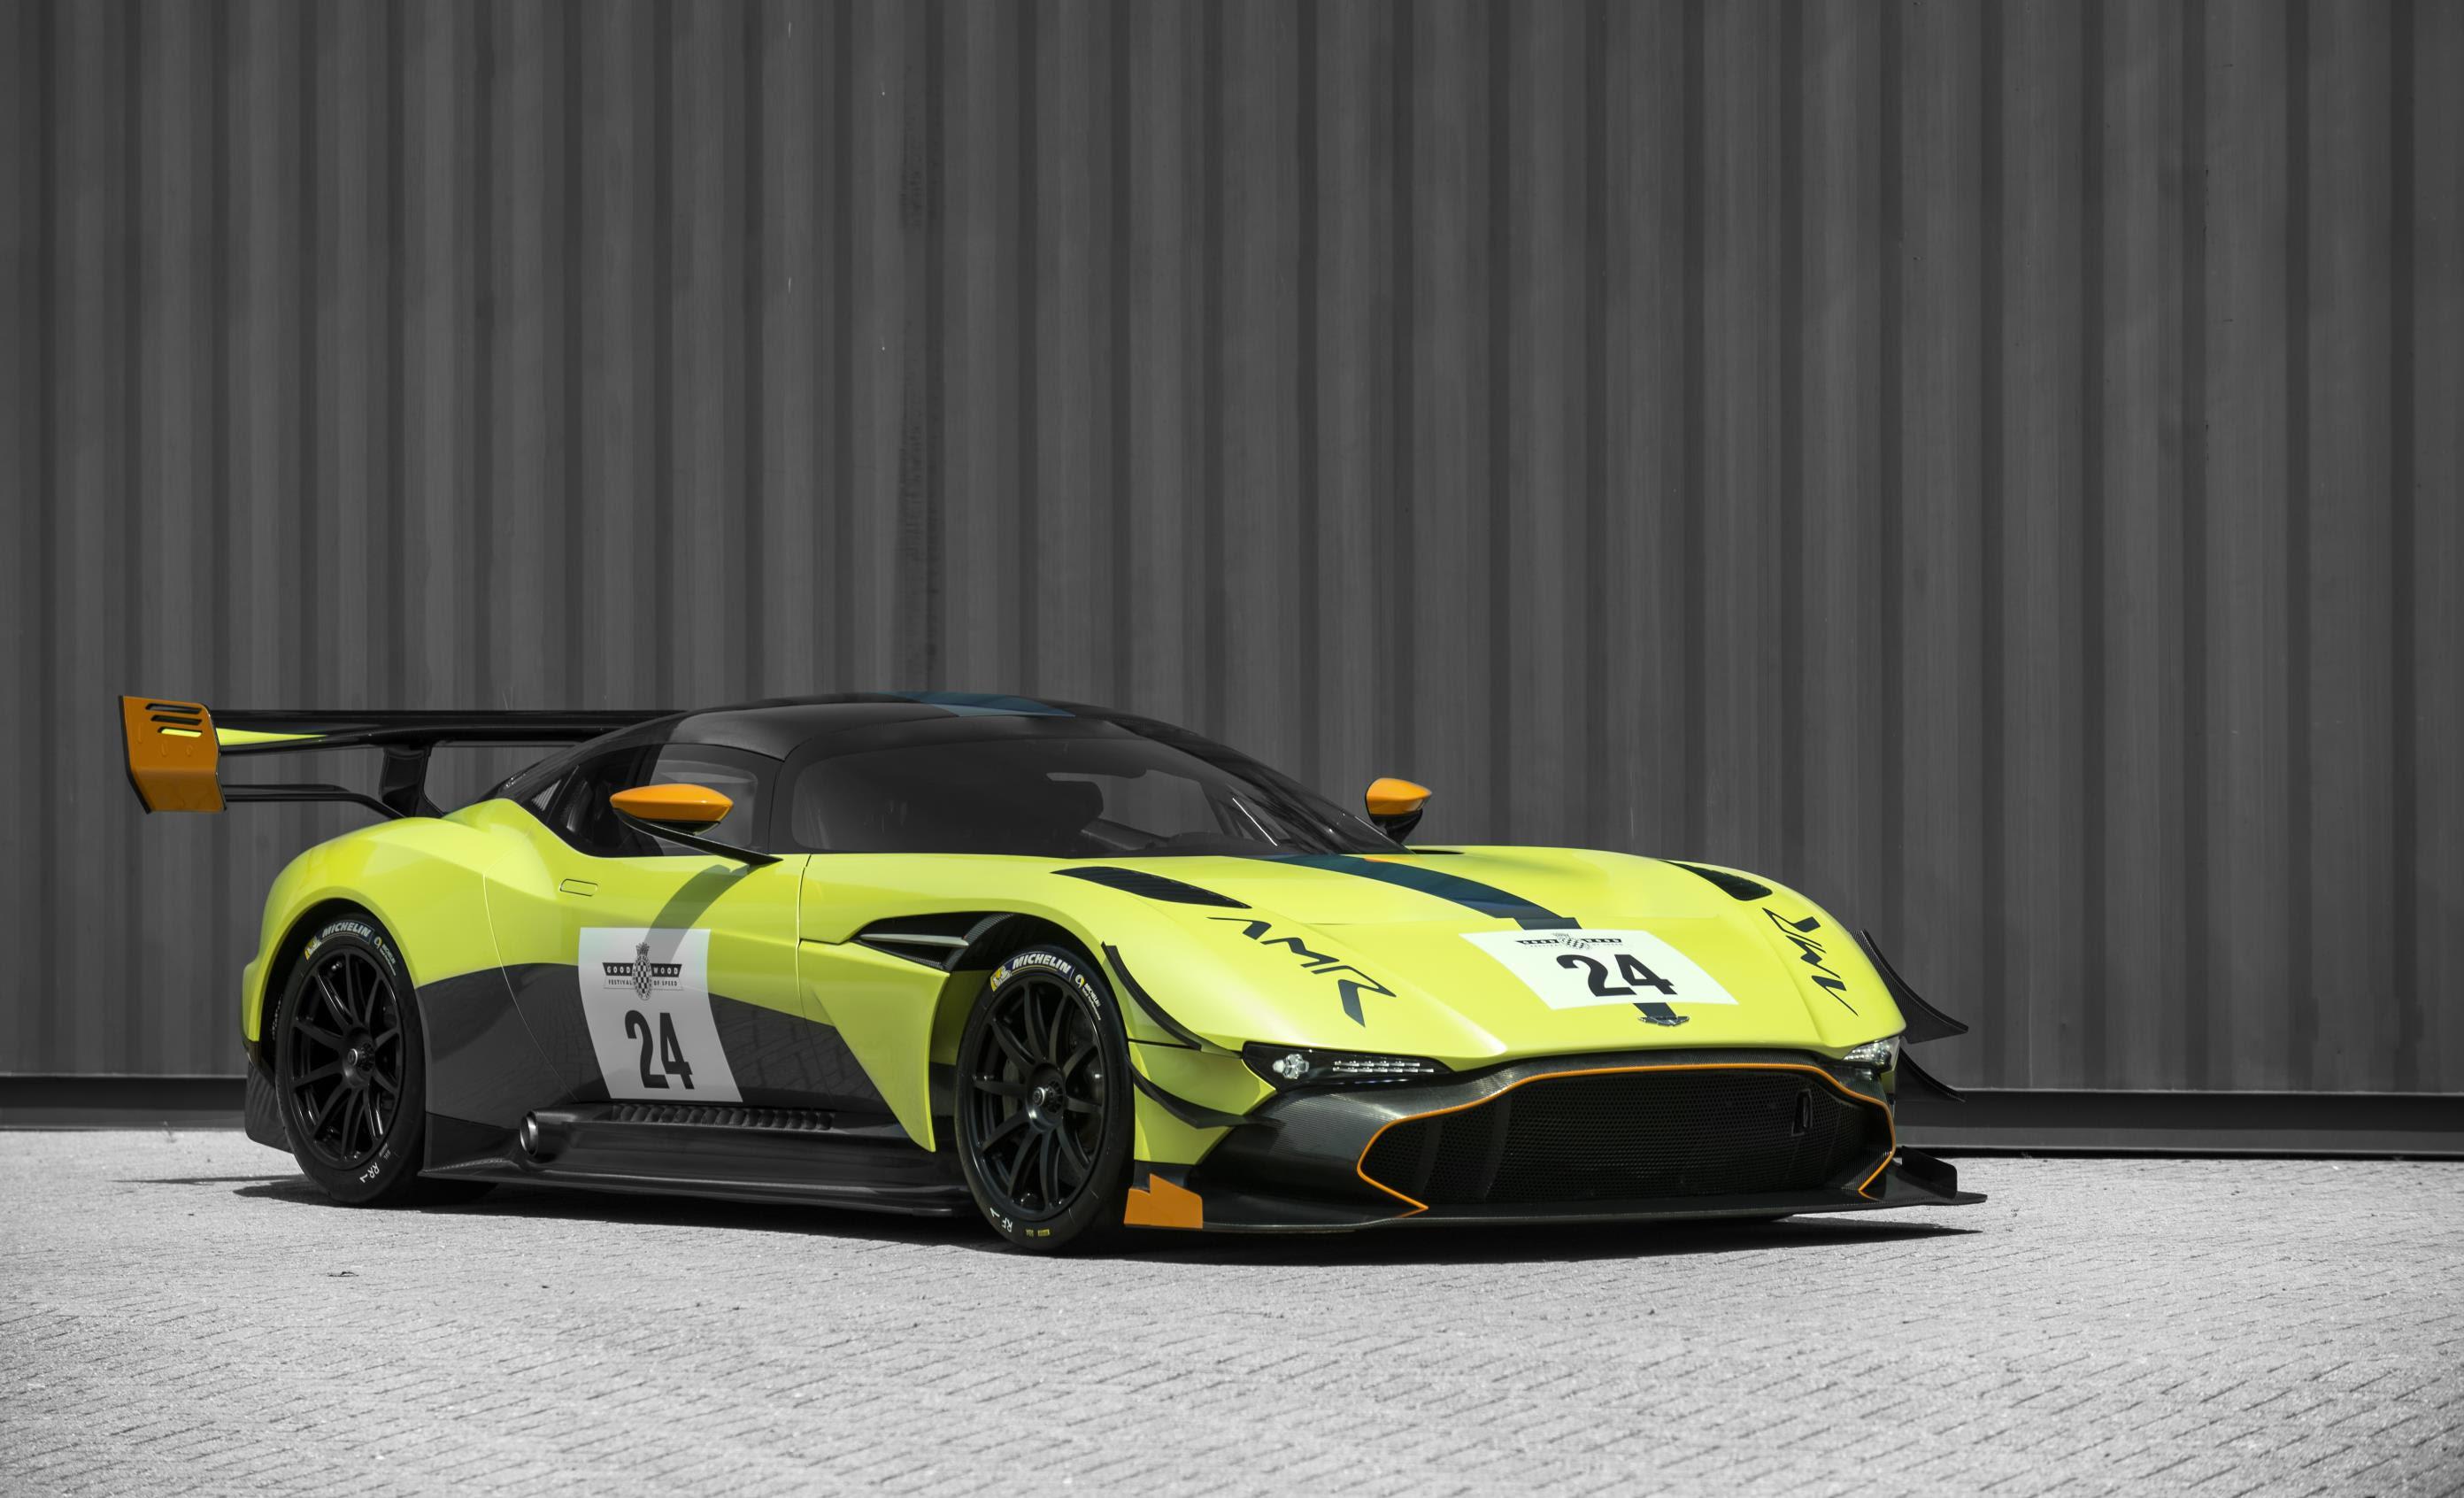 Aston Martin Vulcan Amr Pro Wildest Ever Aston Martin Taken To New Extremes Endurance Info English Spoken